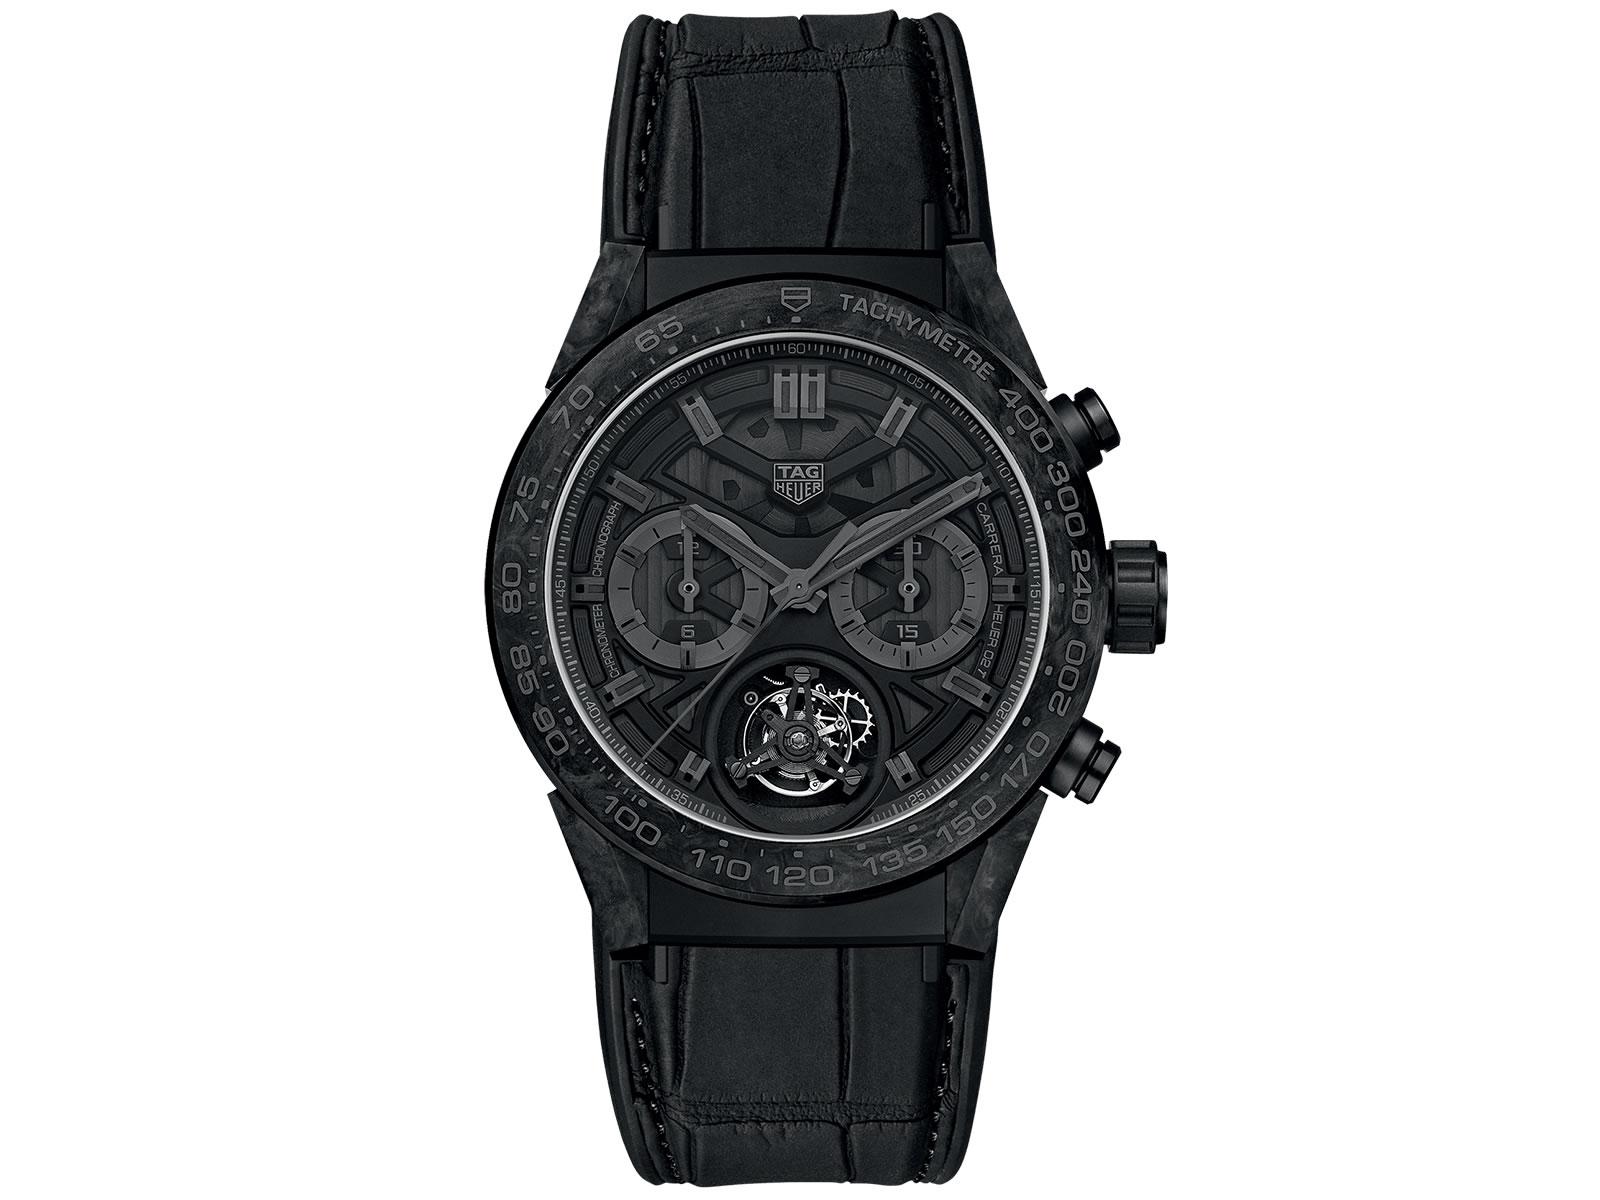 car5a8p-fc6415-tag-heuer-carrera-calibre-heuer02t-automatic-watch-45-mm-4-.jpg